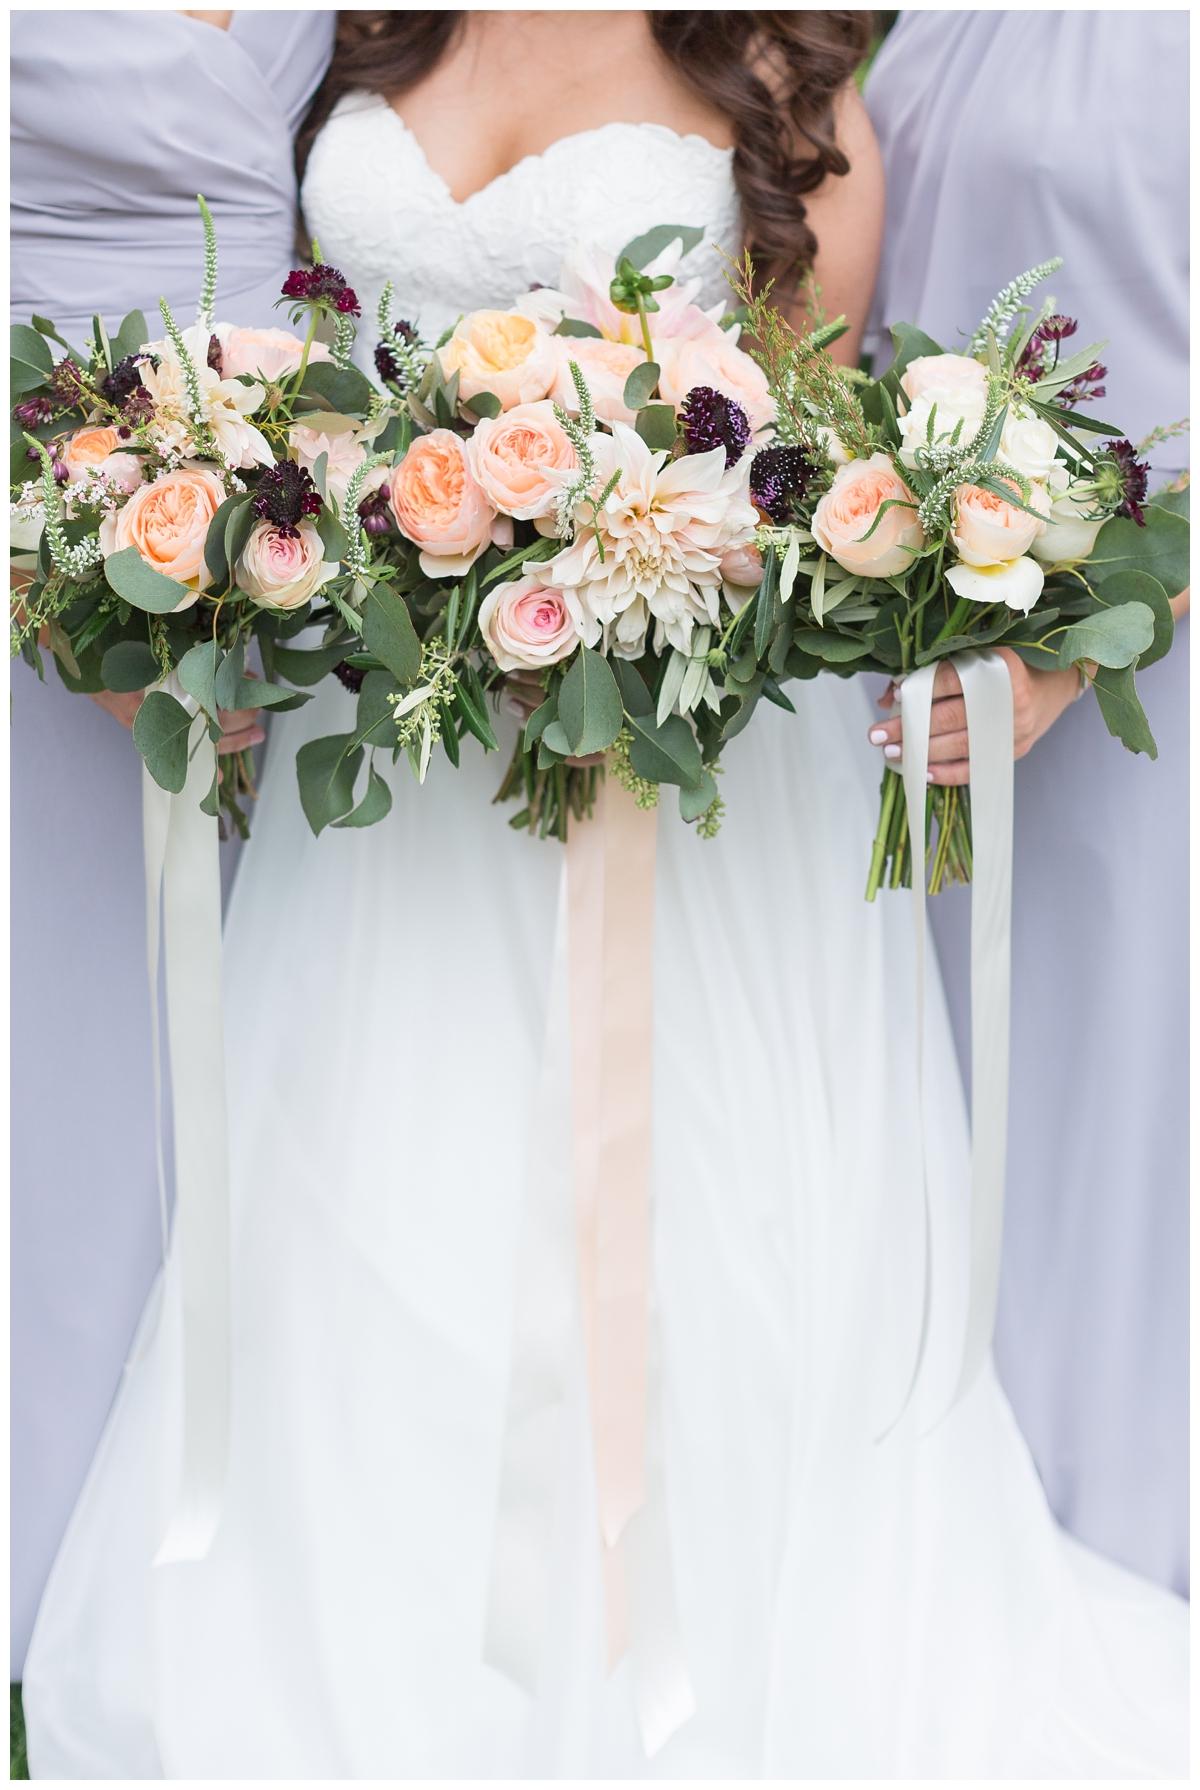 Pageo-Lavender-Farms-Wedding-Photos_4715-1.jpg